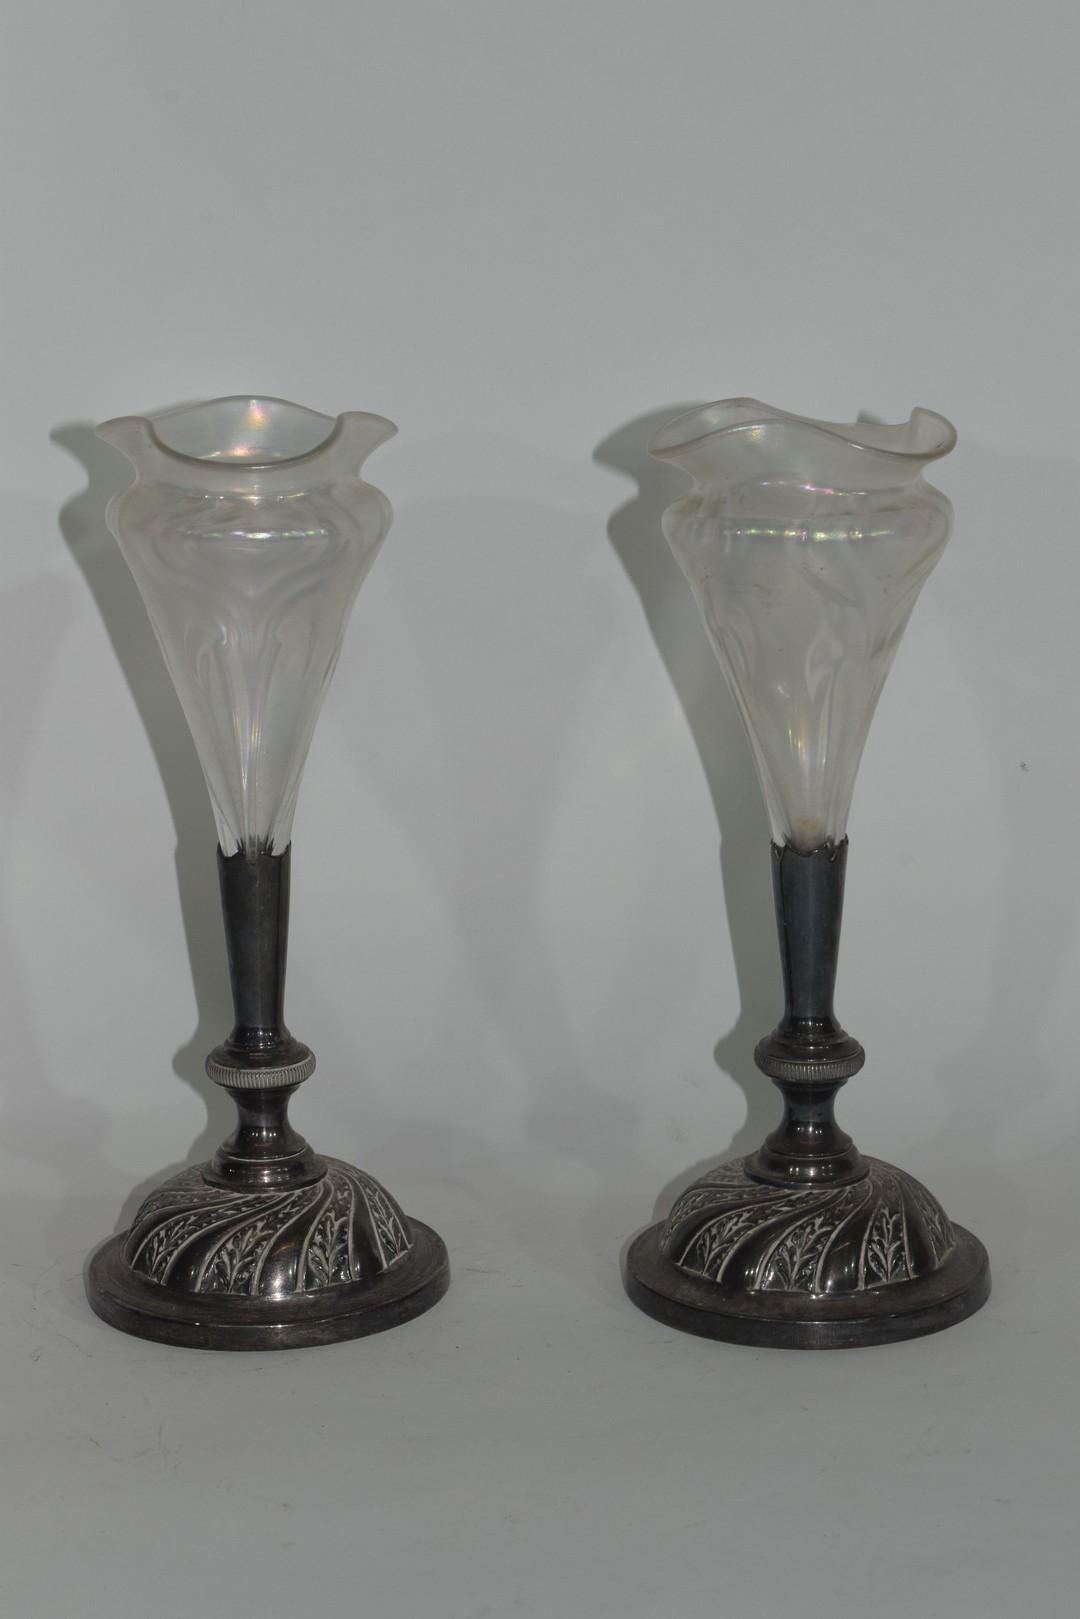 Pair of Art Nouveau bud vases - Image 2 of 5